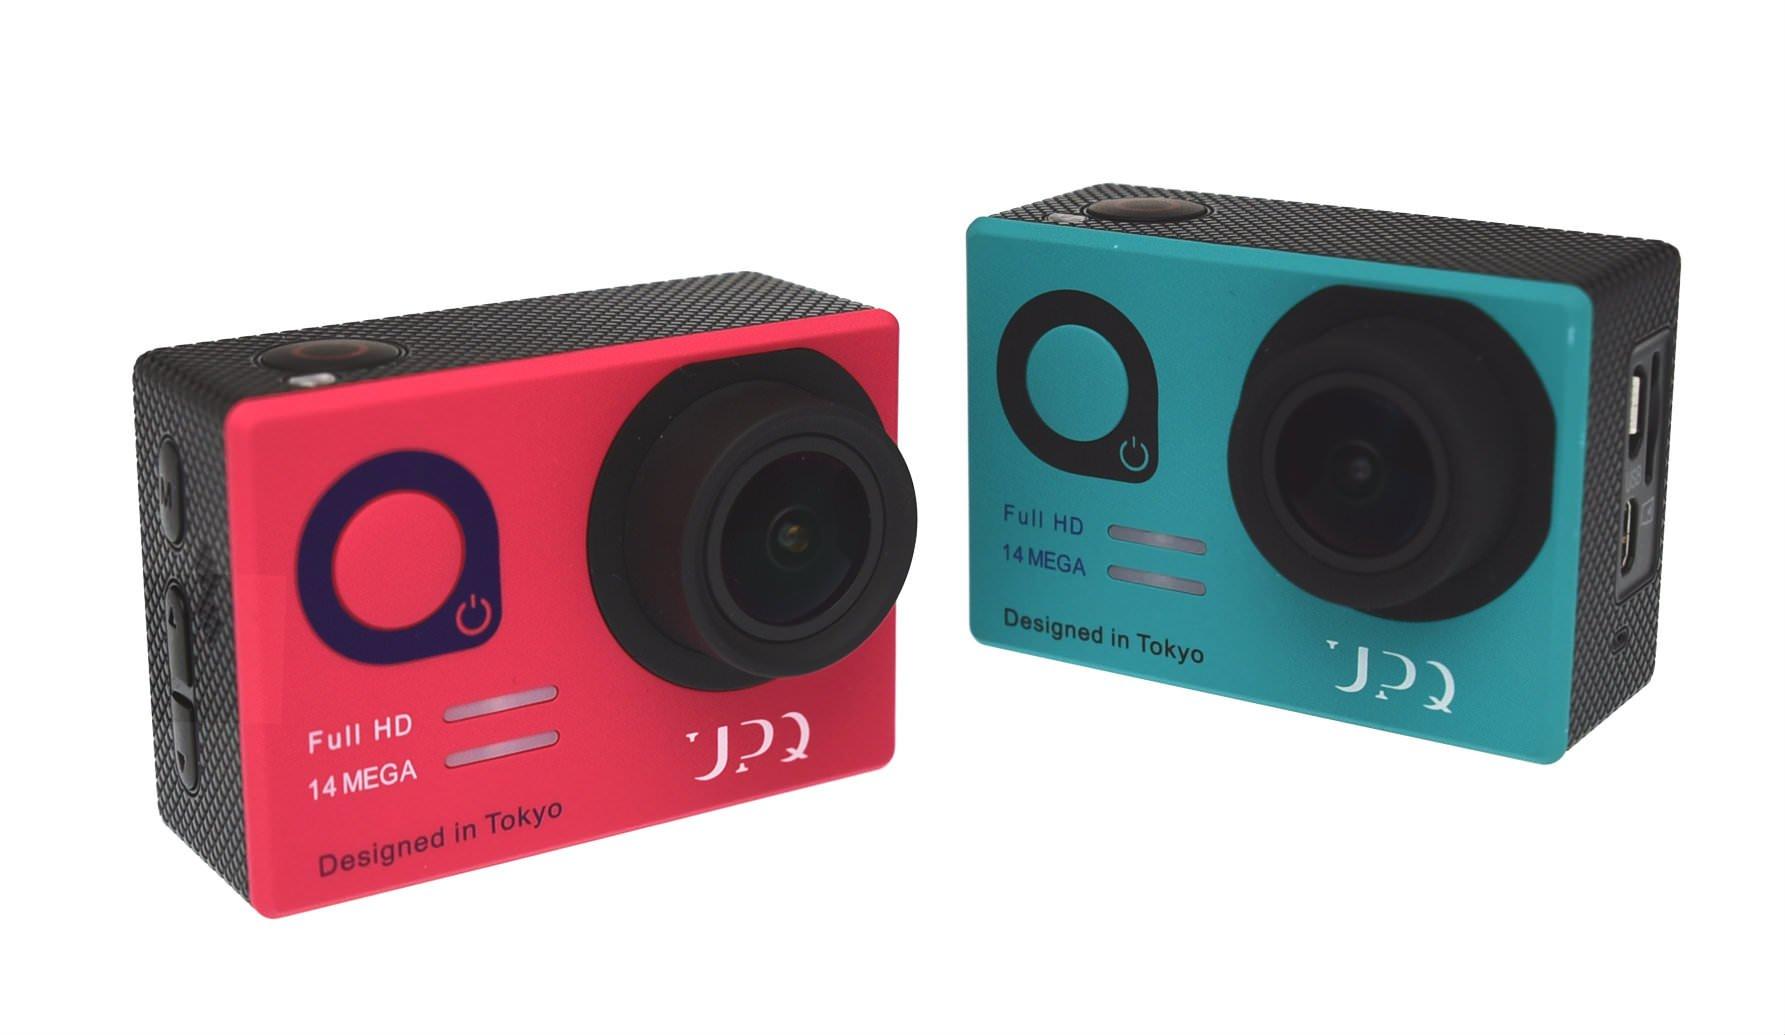 Q-camera ACX1